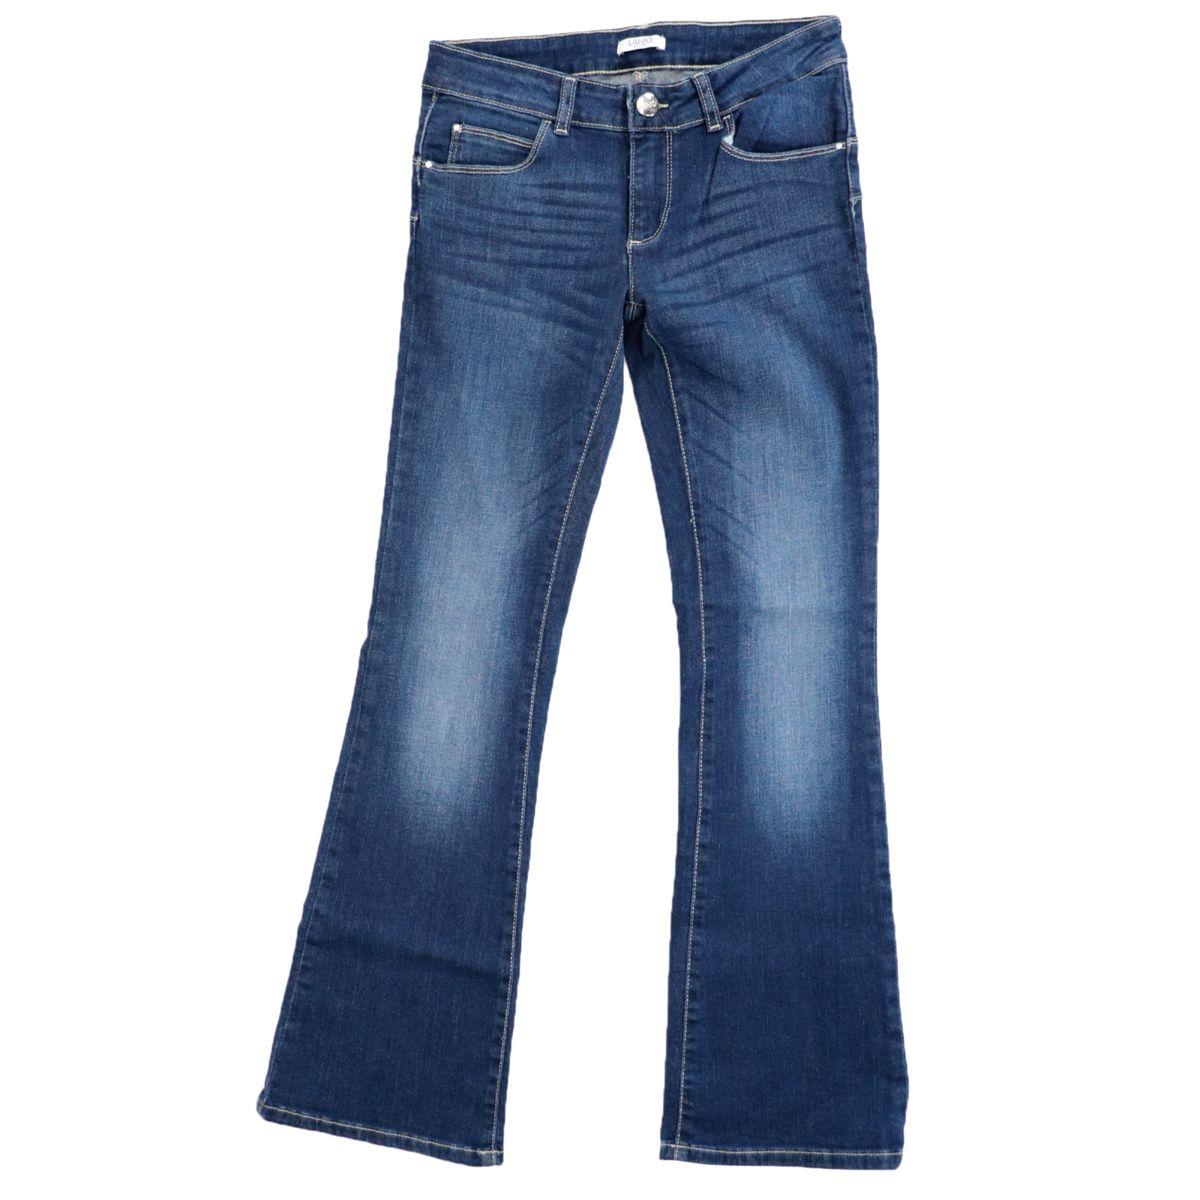 Jeans with stonewash wash and flared leg Medium denim Liu Jo